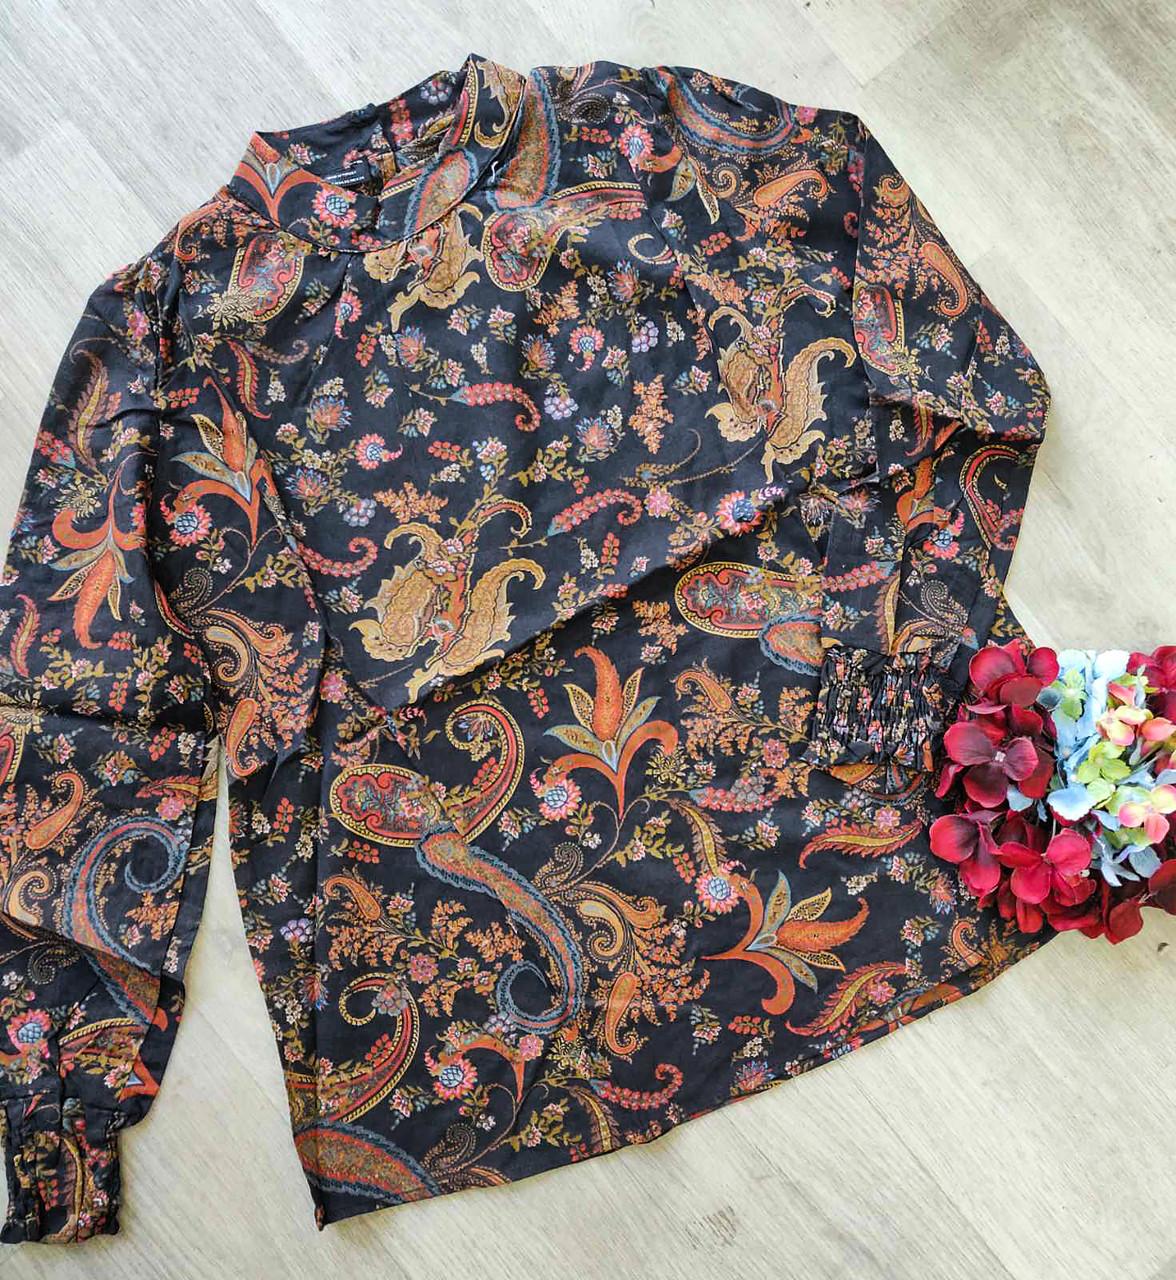 Женская закрытая блуза с узорами (42-50)